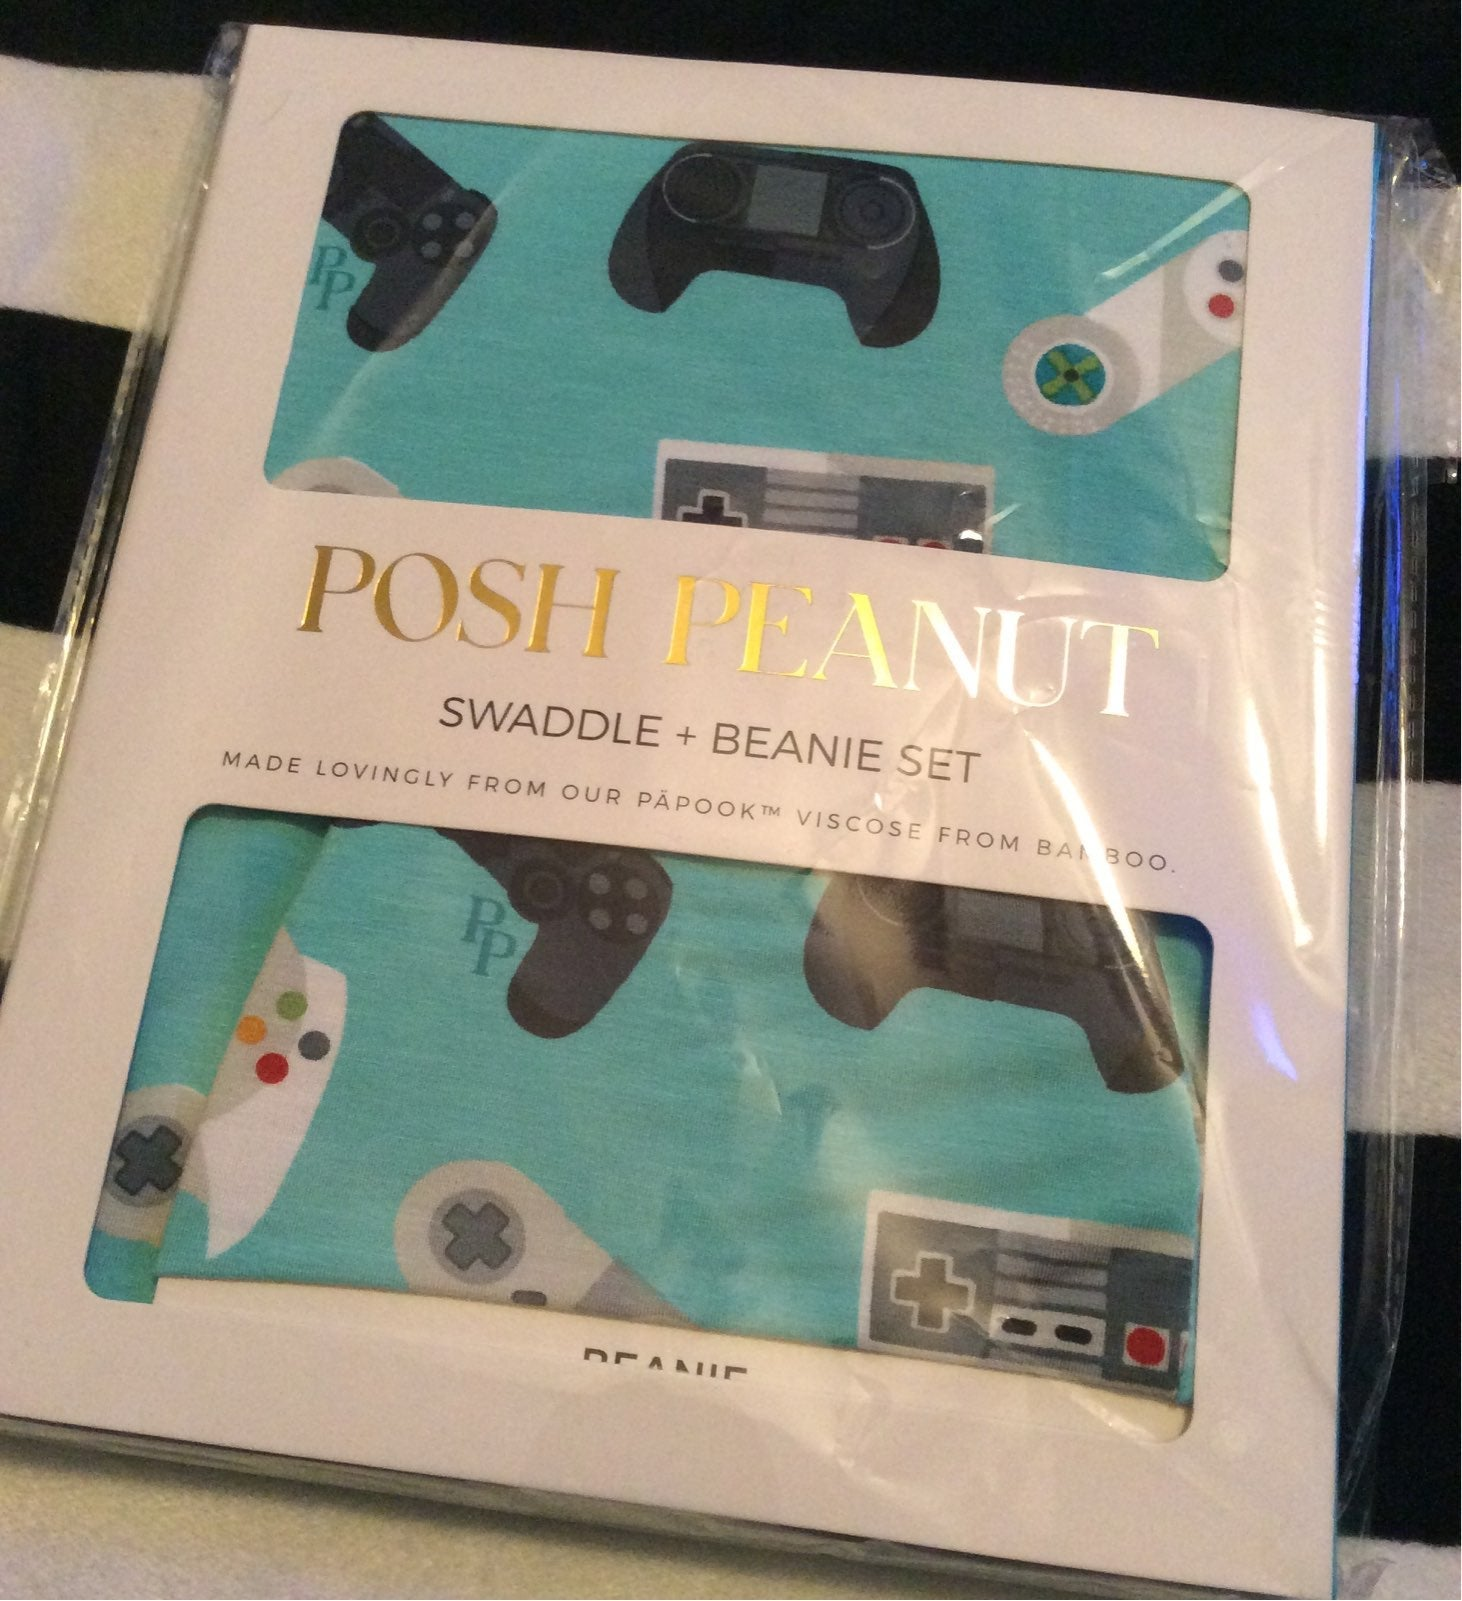 Posh Peanut gamer